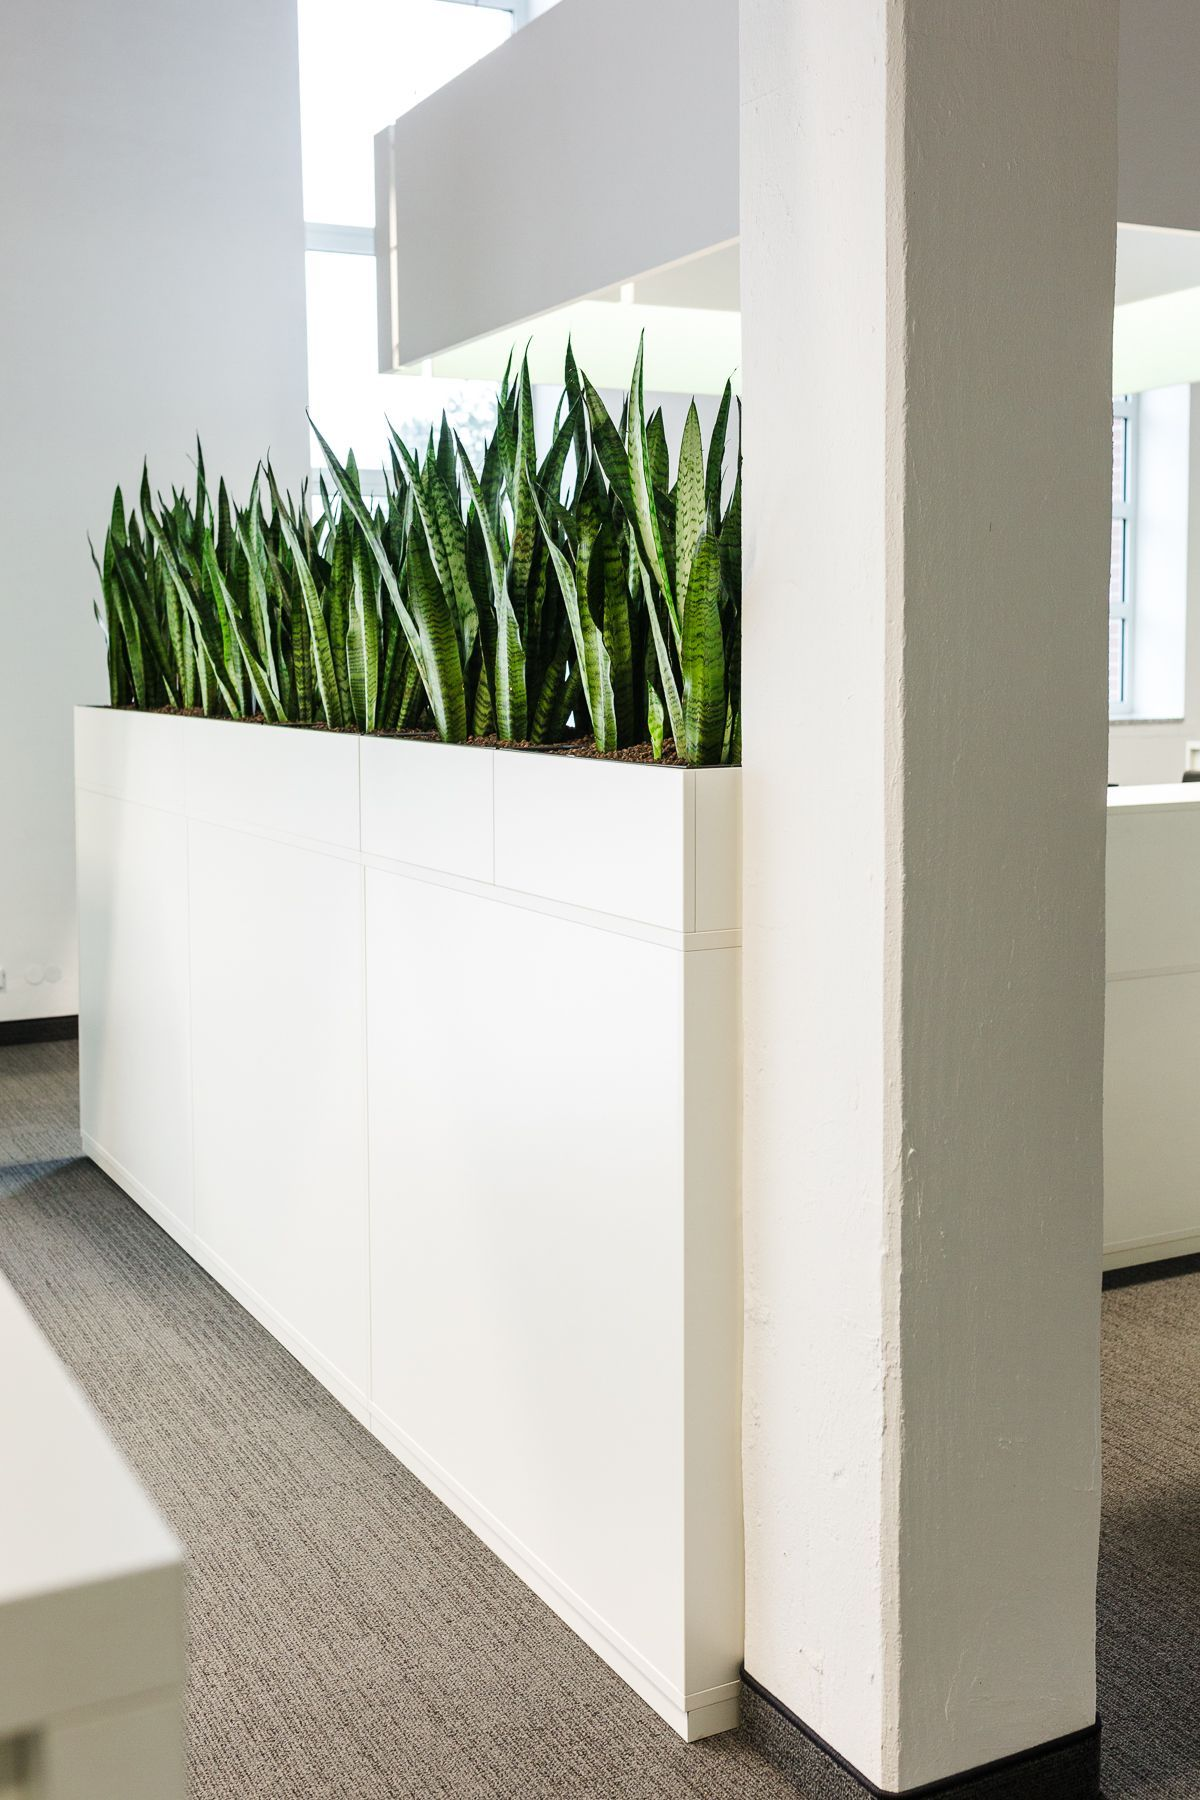 Begrünung Blickfang Büro Puristische Sichtschutz Sideboards ...